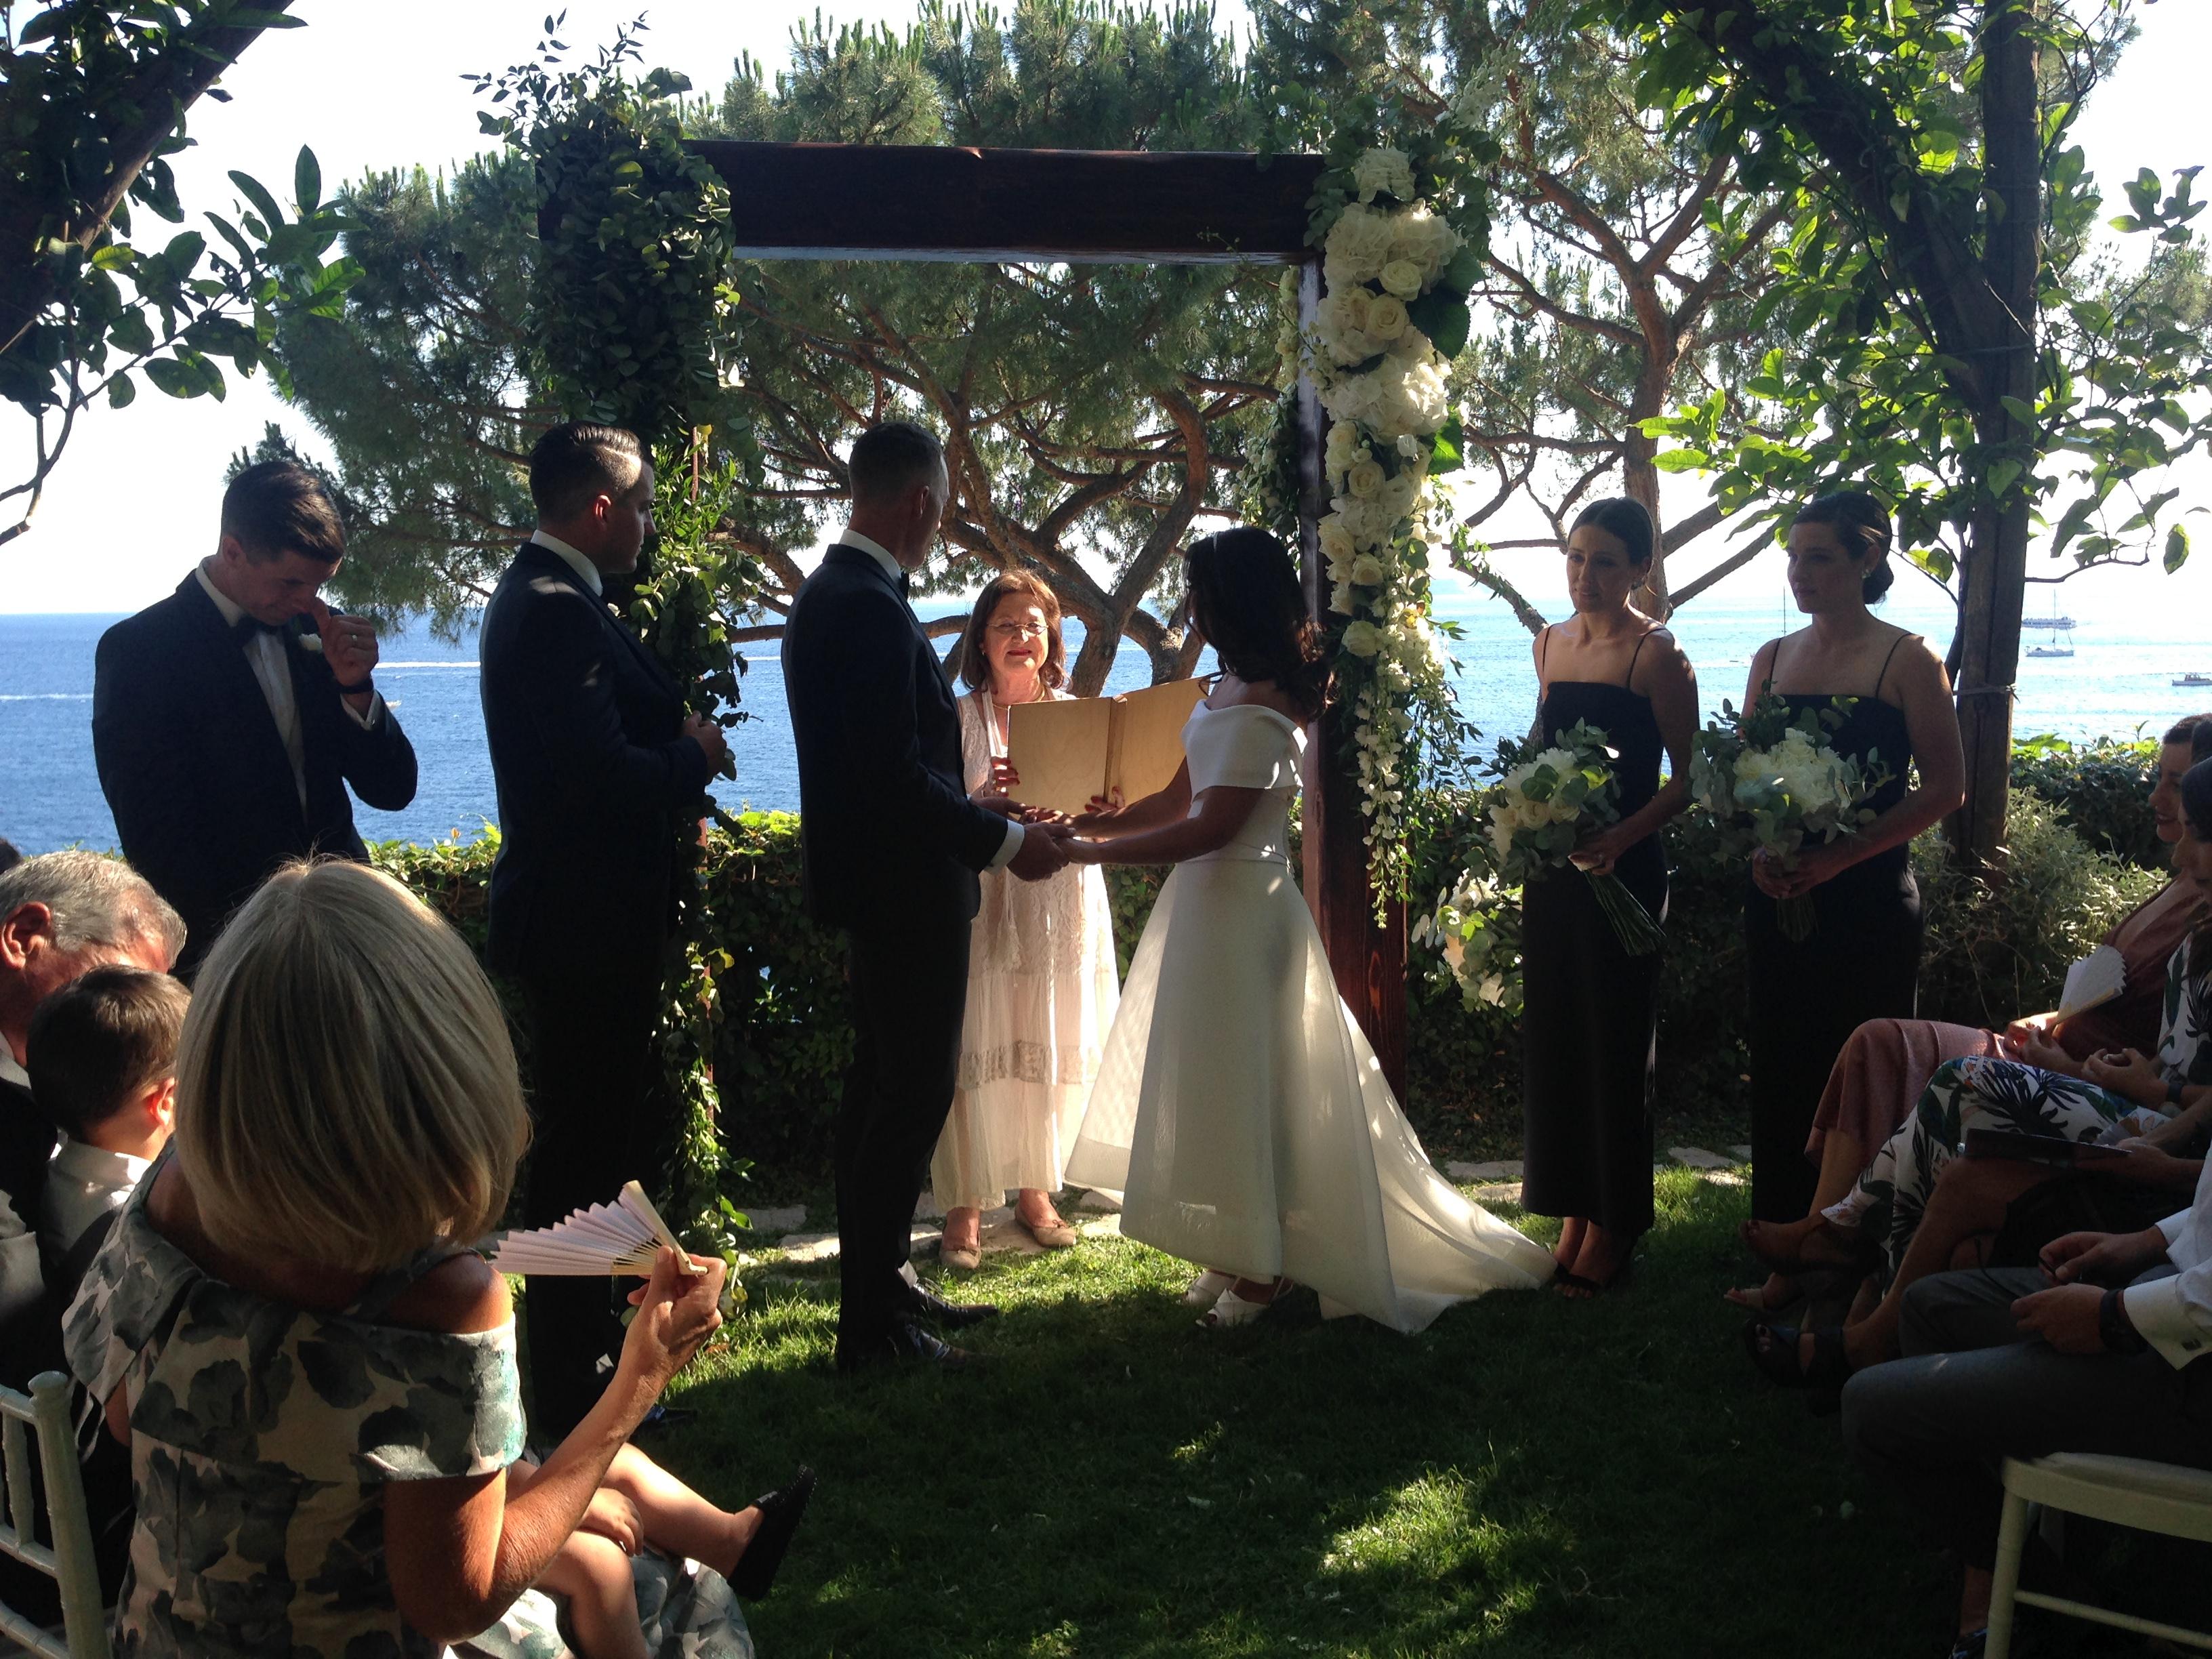 https://www.weddingamalfi.com/wp-content/uploads/Laura-and-Jarrod-seaside-wedding-ceremony-on-the-Amalfi-Coast.jpg